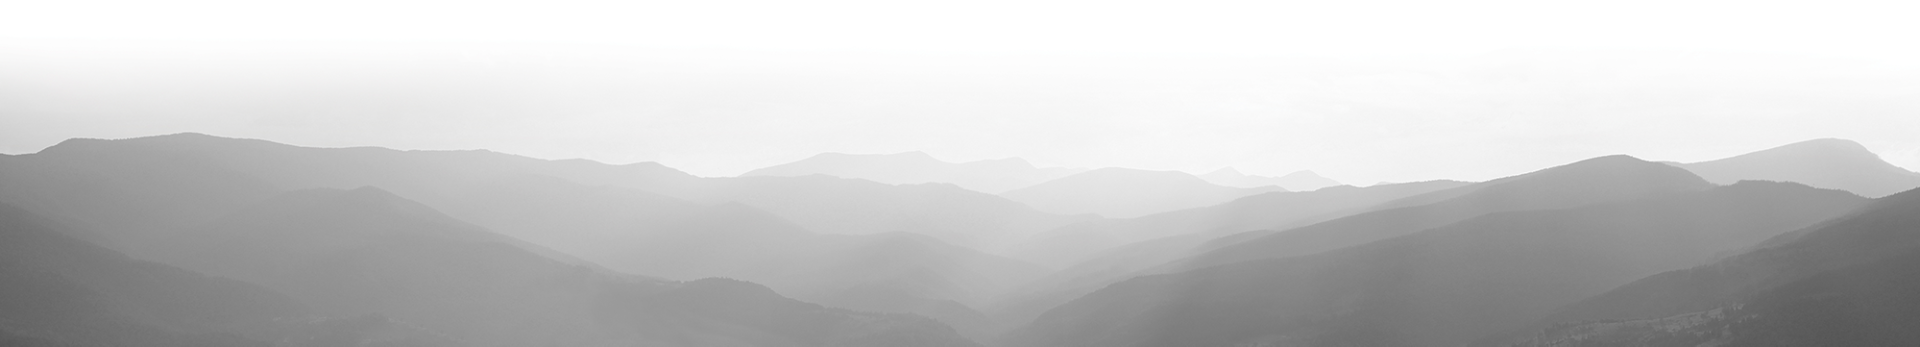 Ac light mountains